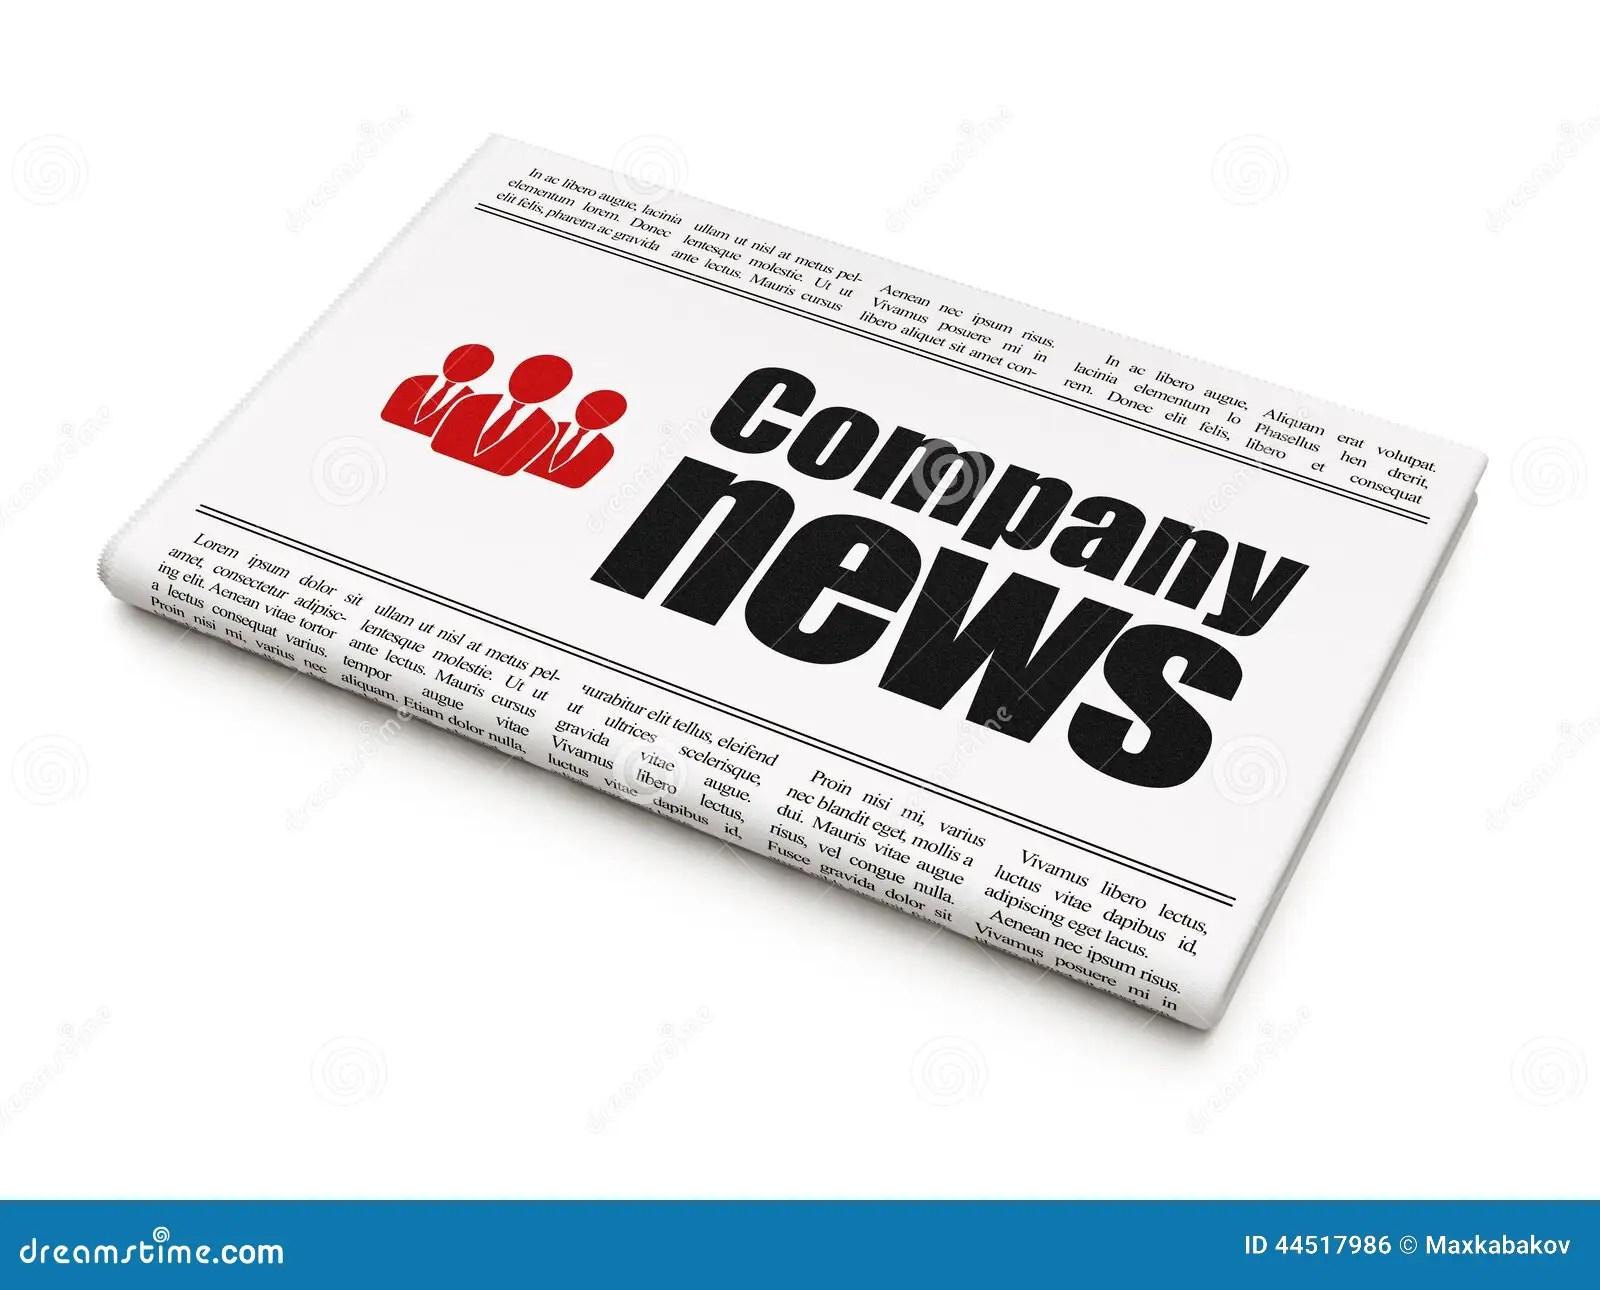 News News Concept: Newspaper With Company News And